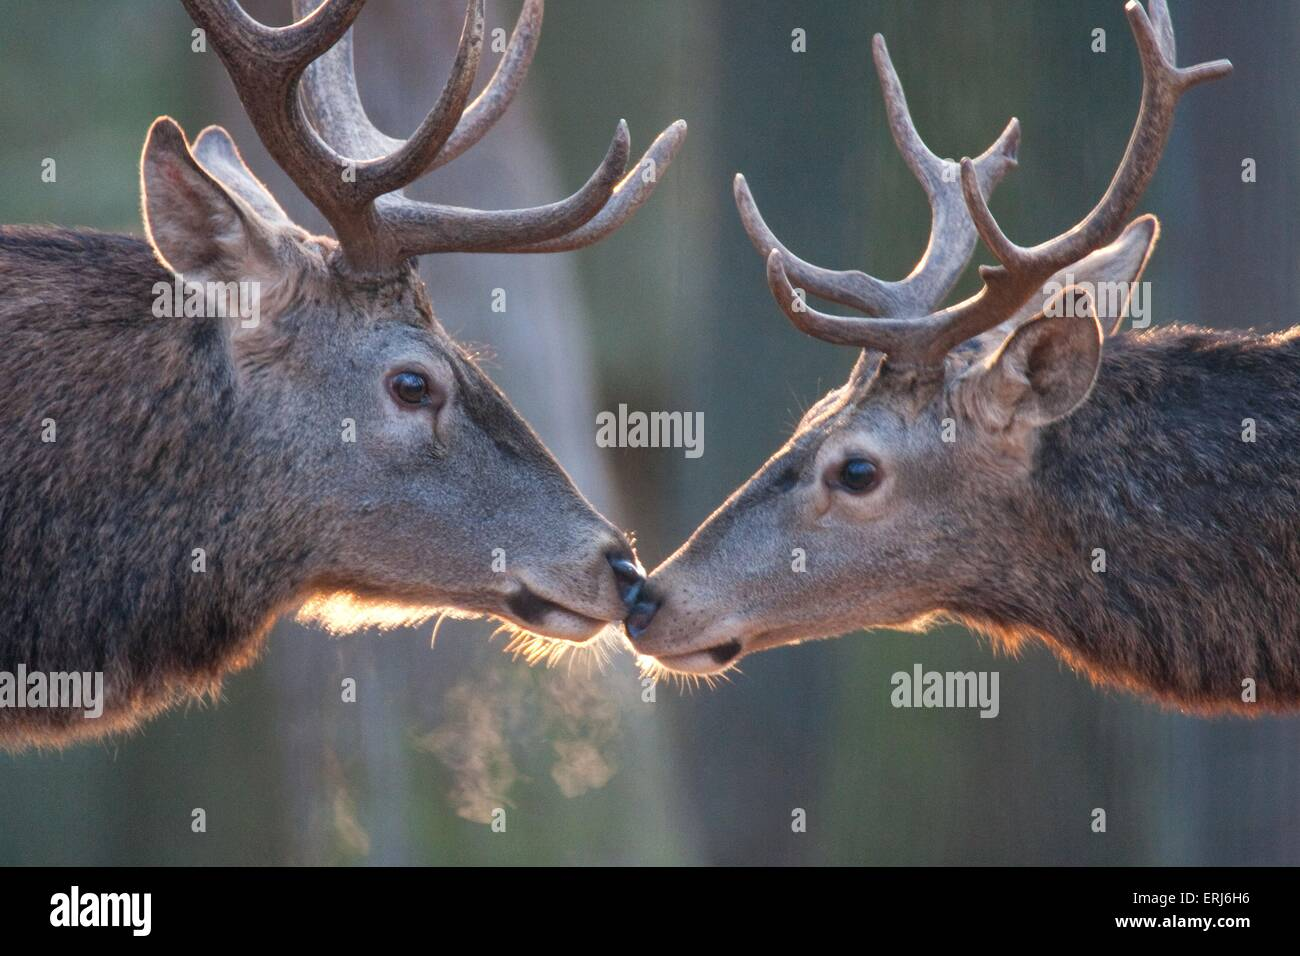 red deer - Stock Image